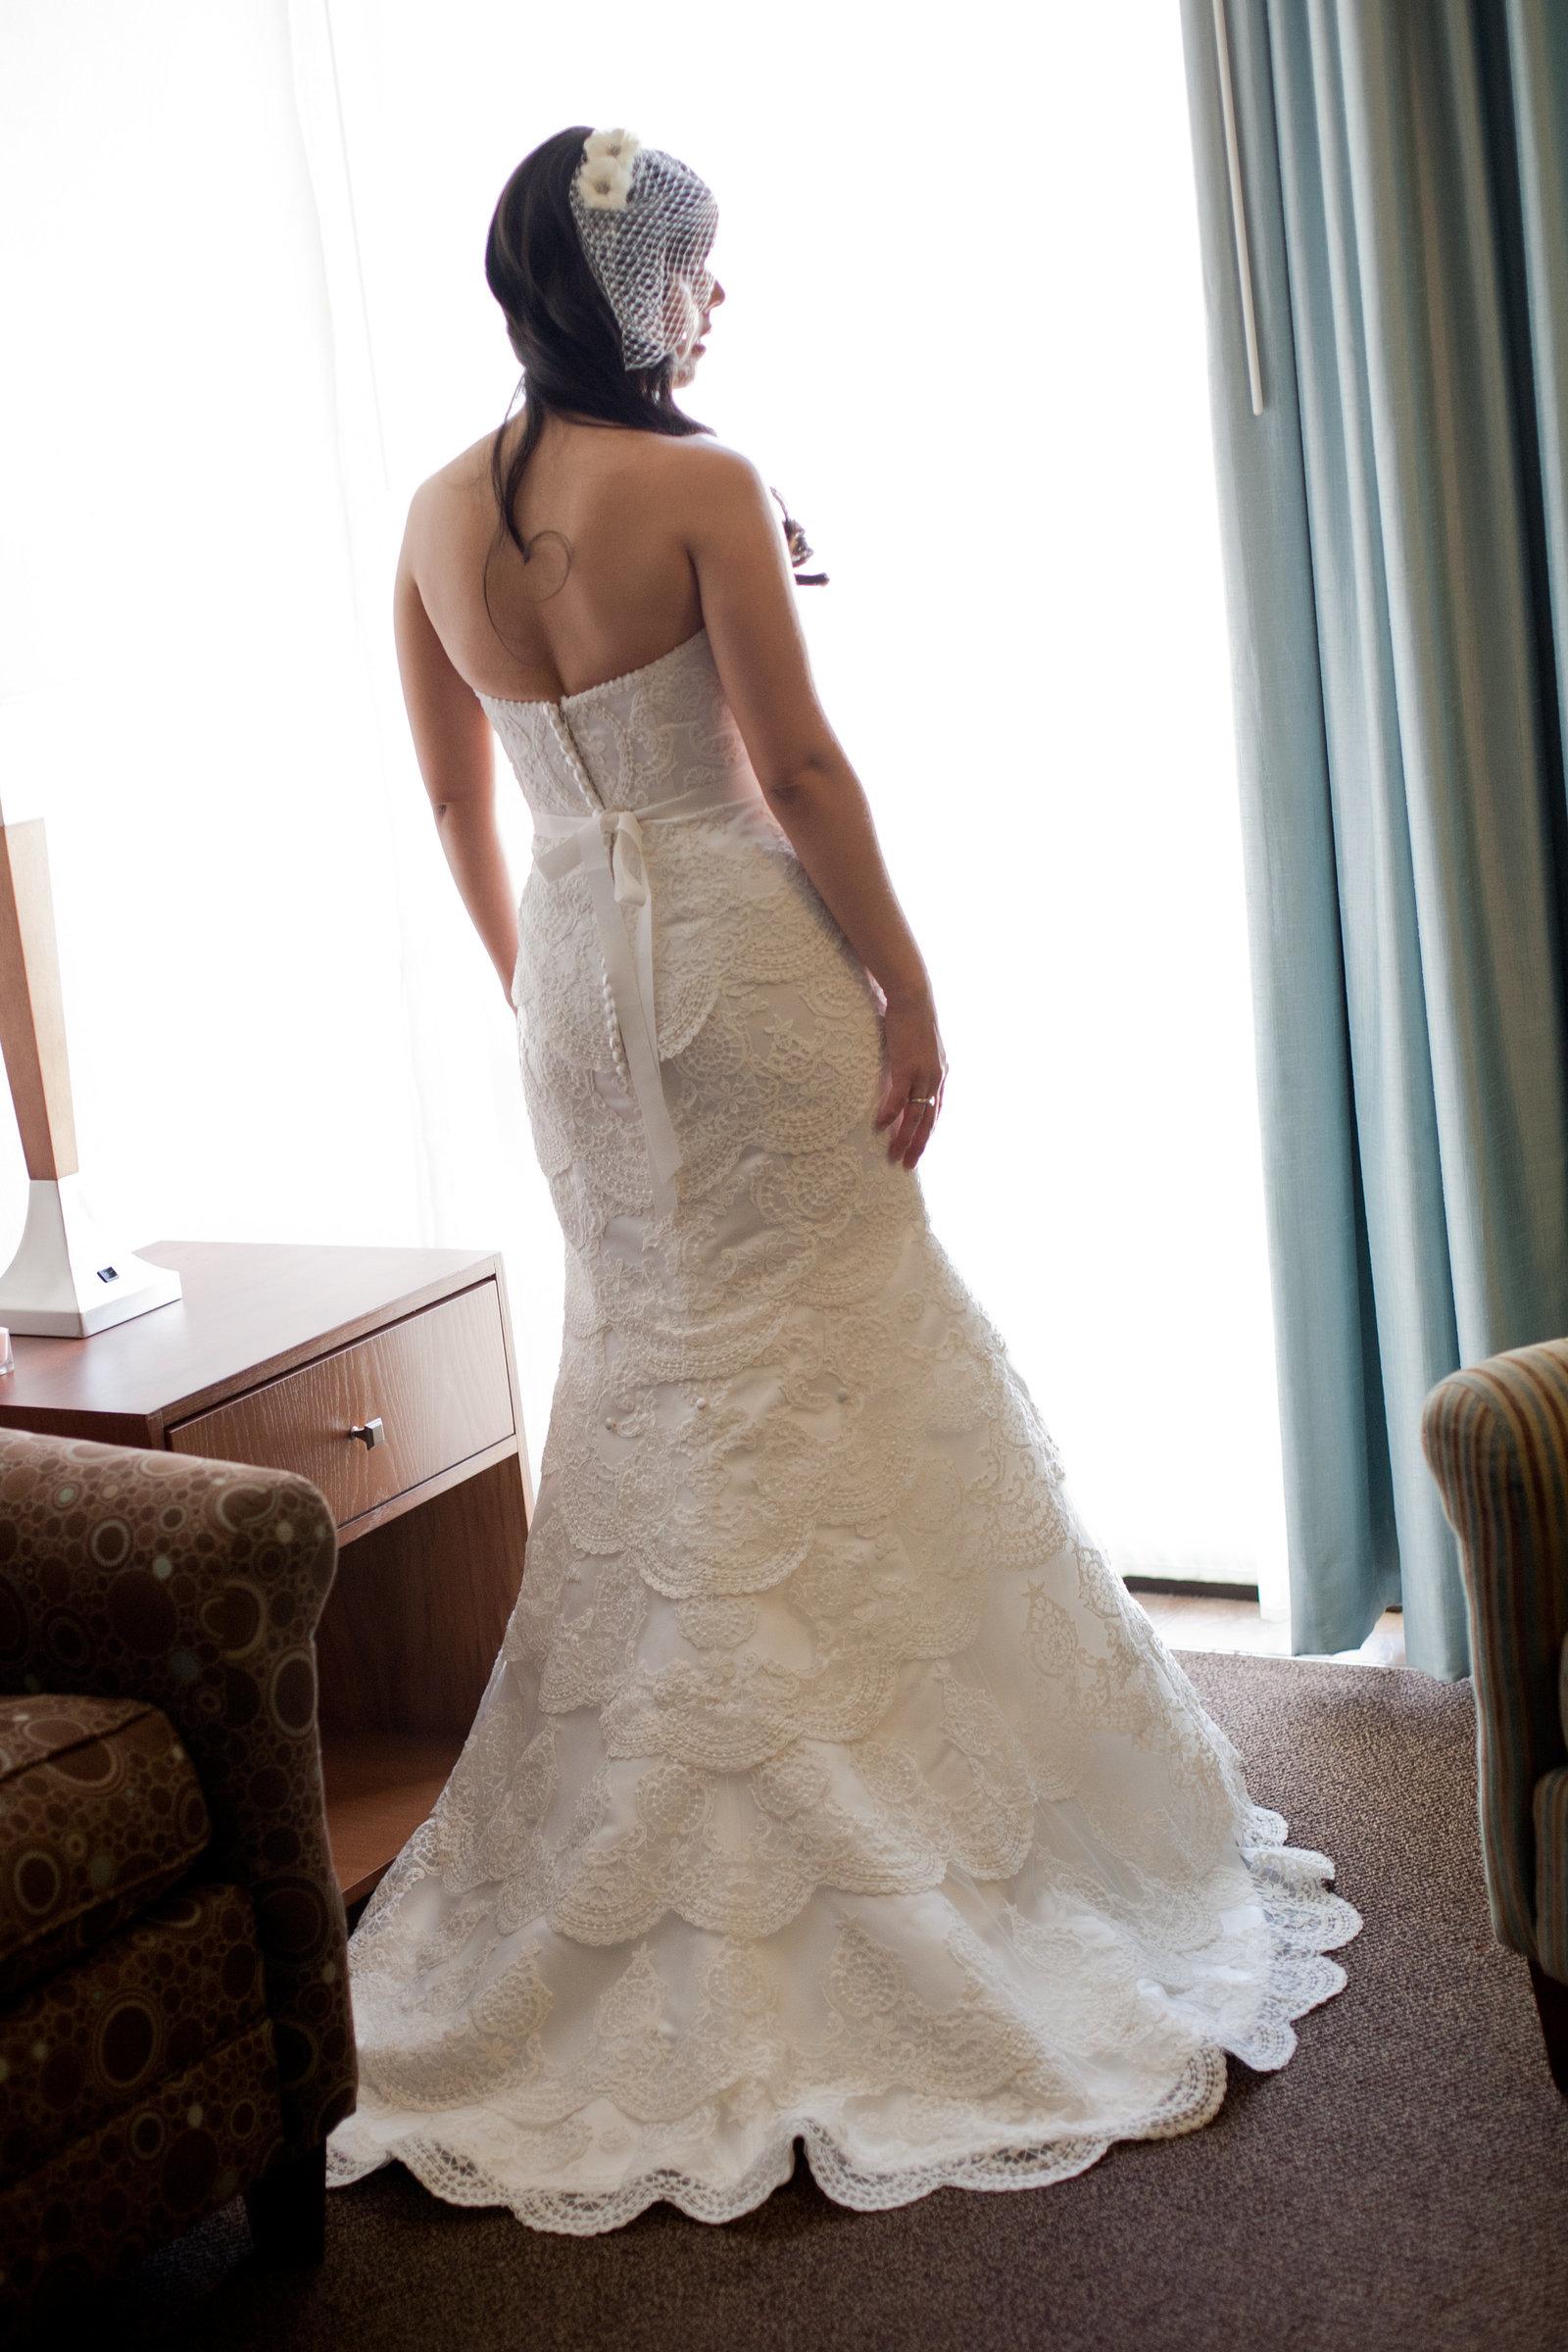 Austin Family Photographer, Tiffany Chapman, bride in window light photo